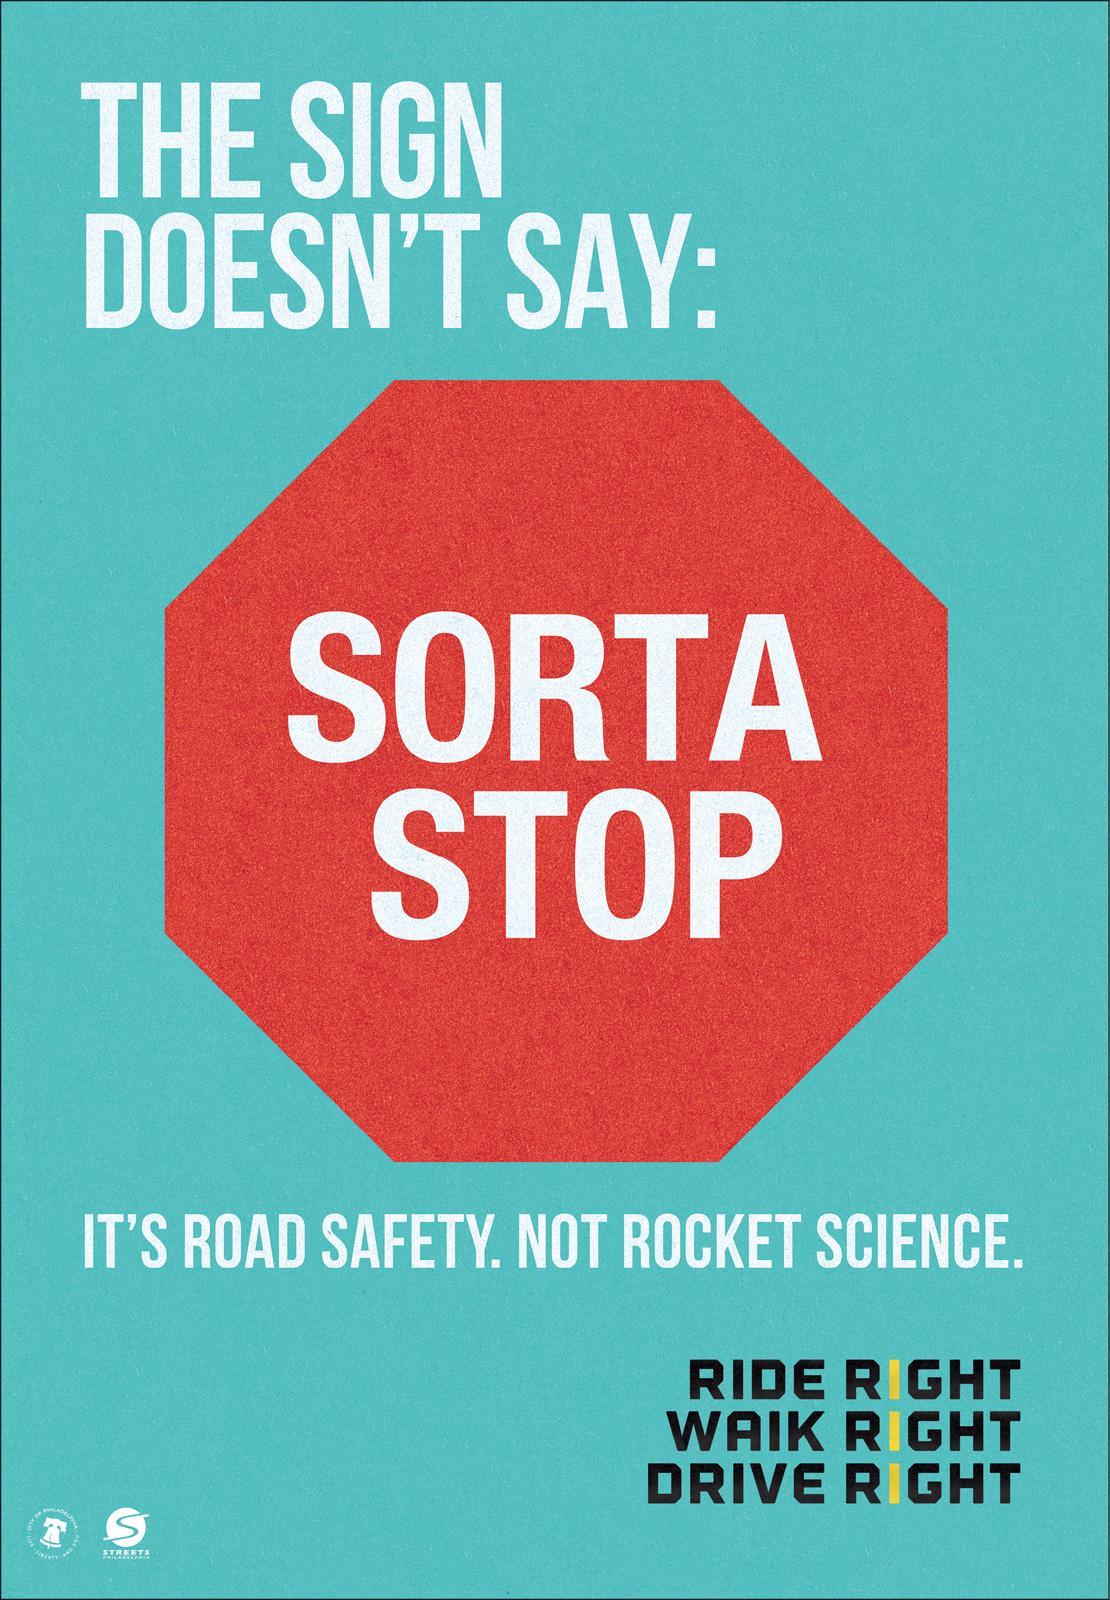 Mayor's Office of Transportation Outdoor Ad -  Sorta stop